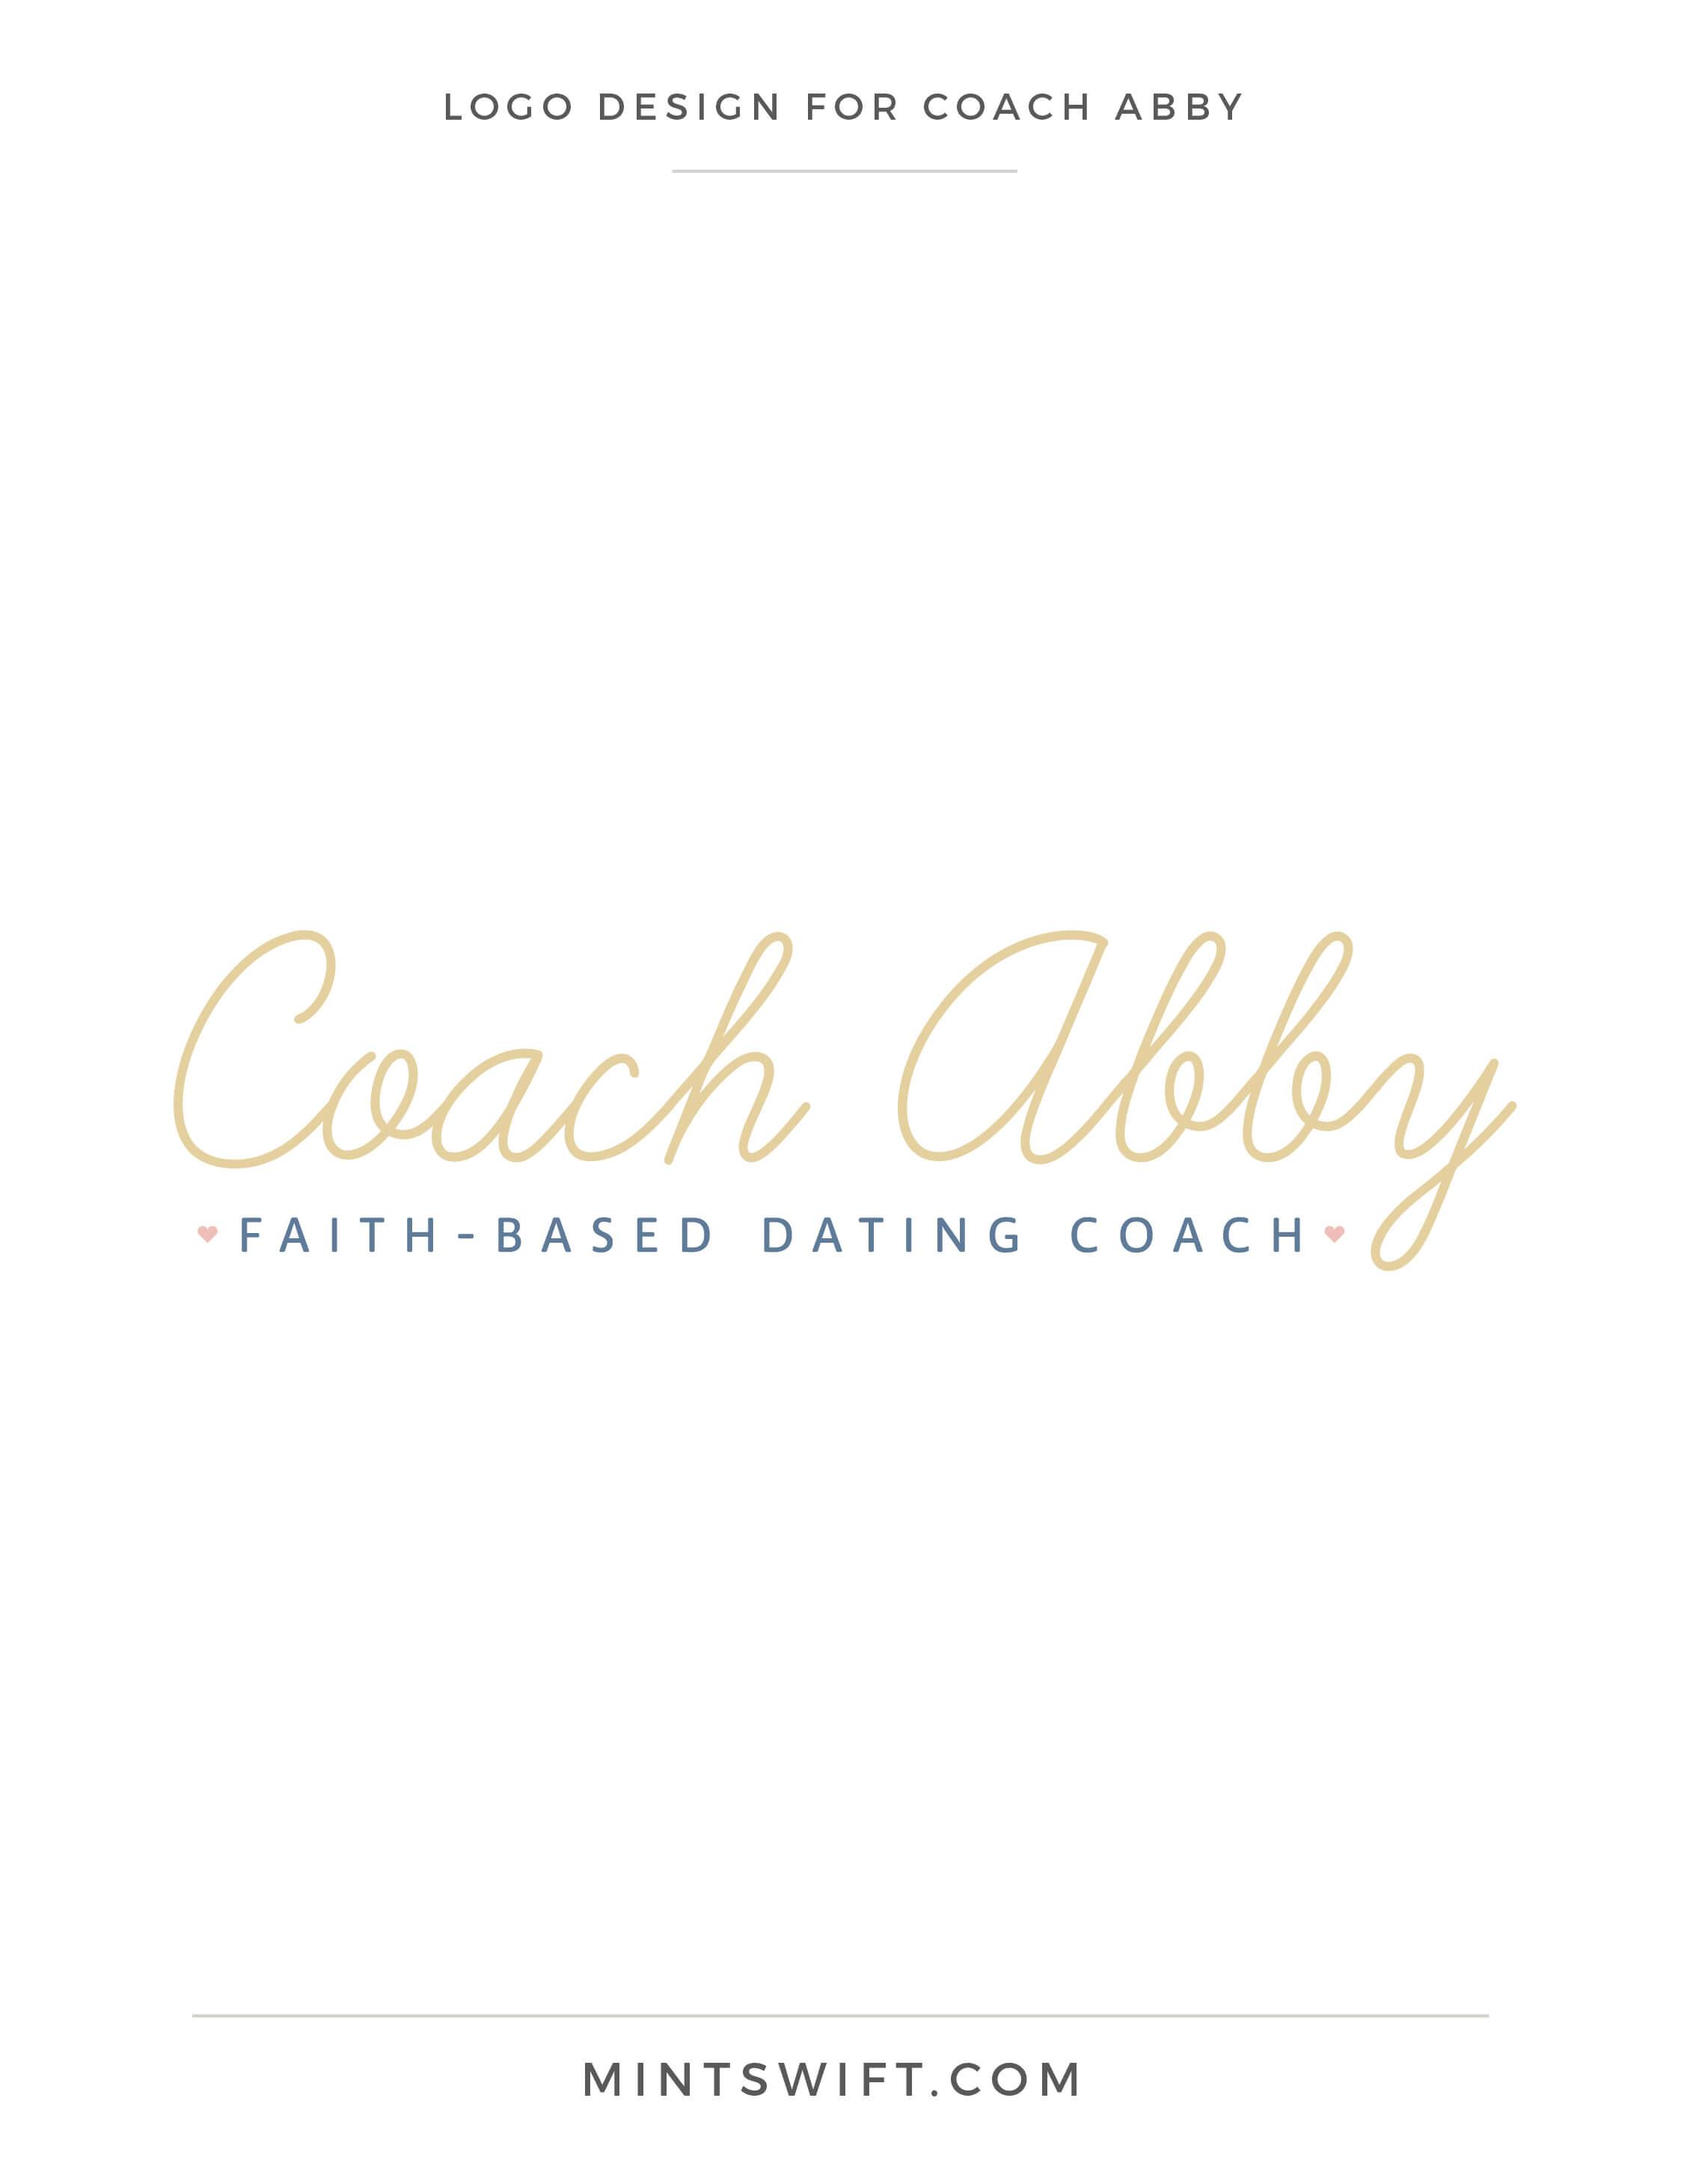 Coach Abby - Logo Design - Brand Design - MintSwift